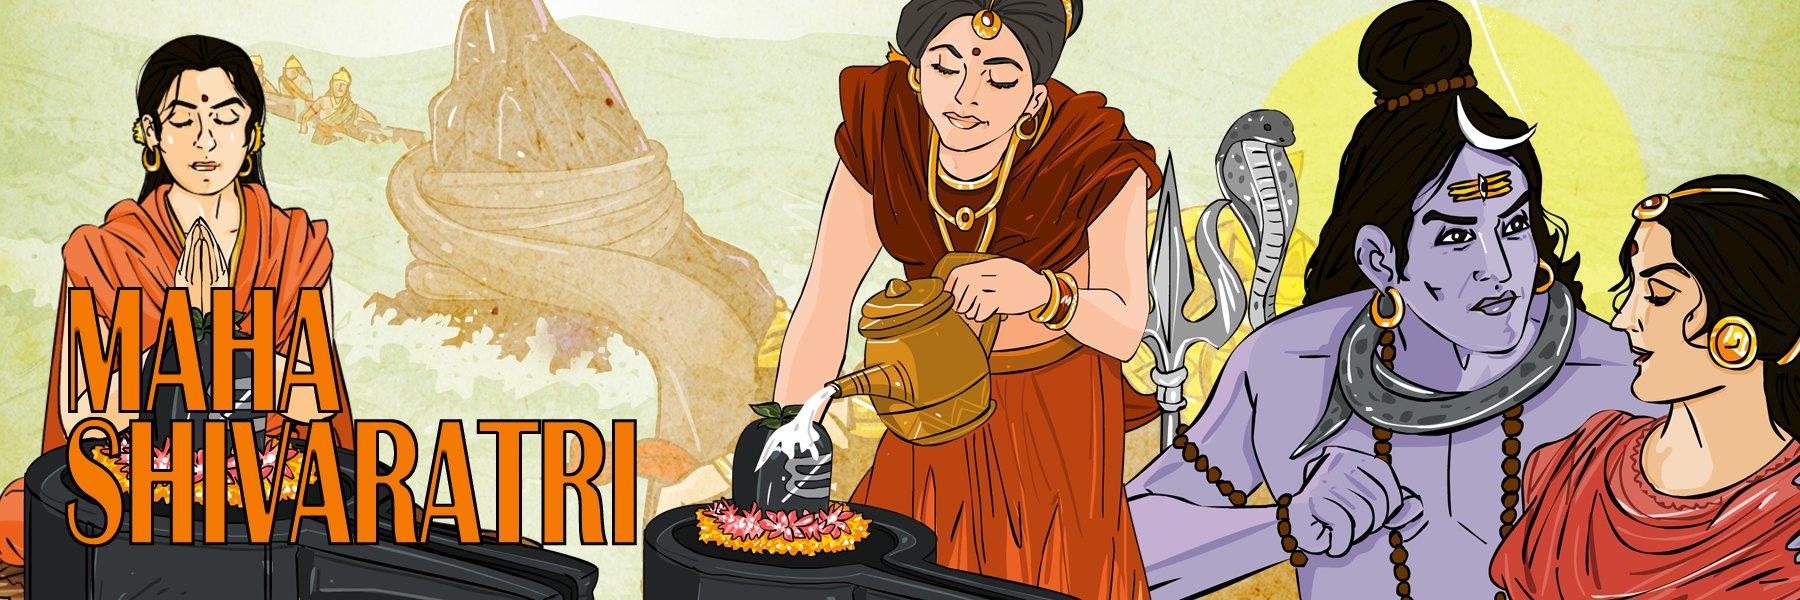 Let's celebrate Maha Shivaratri!